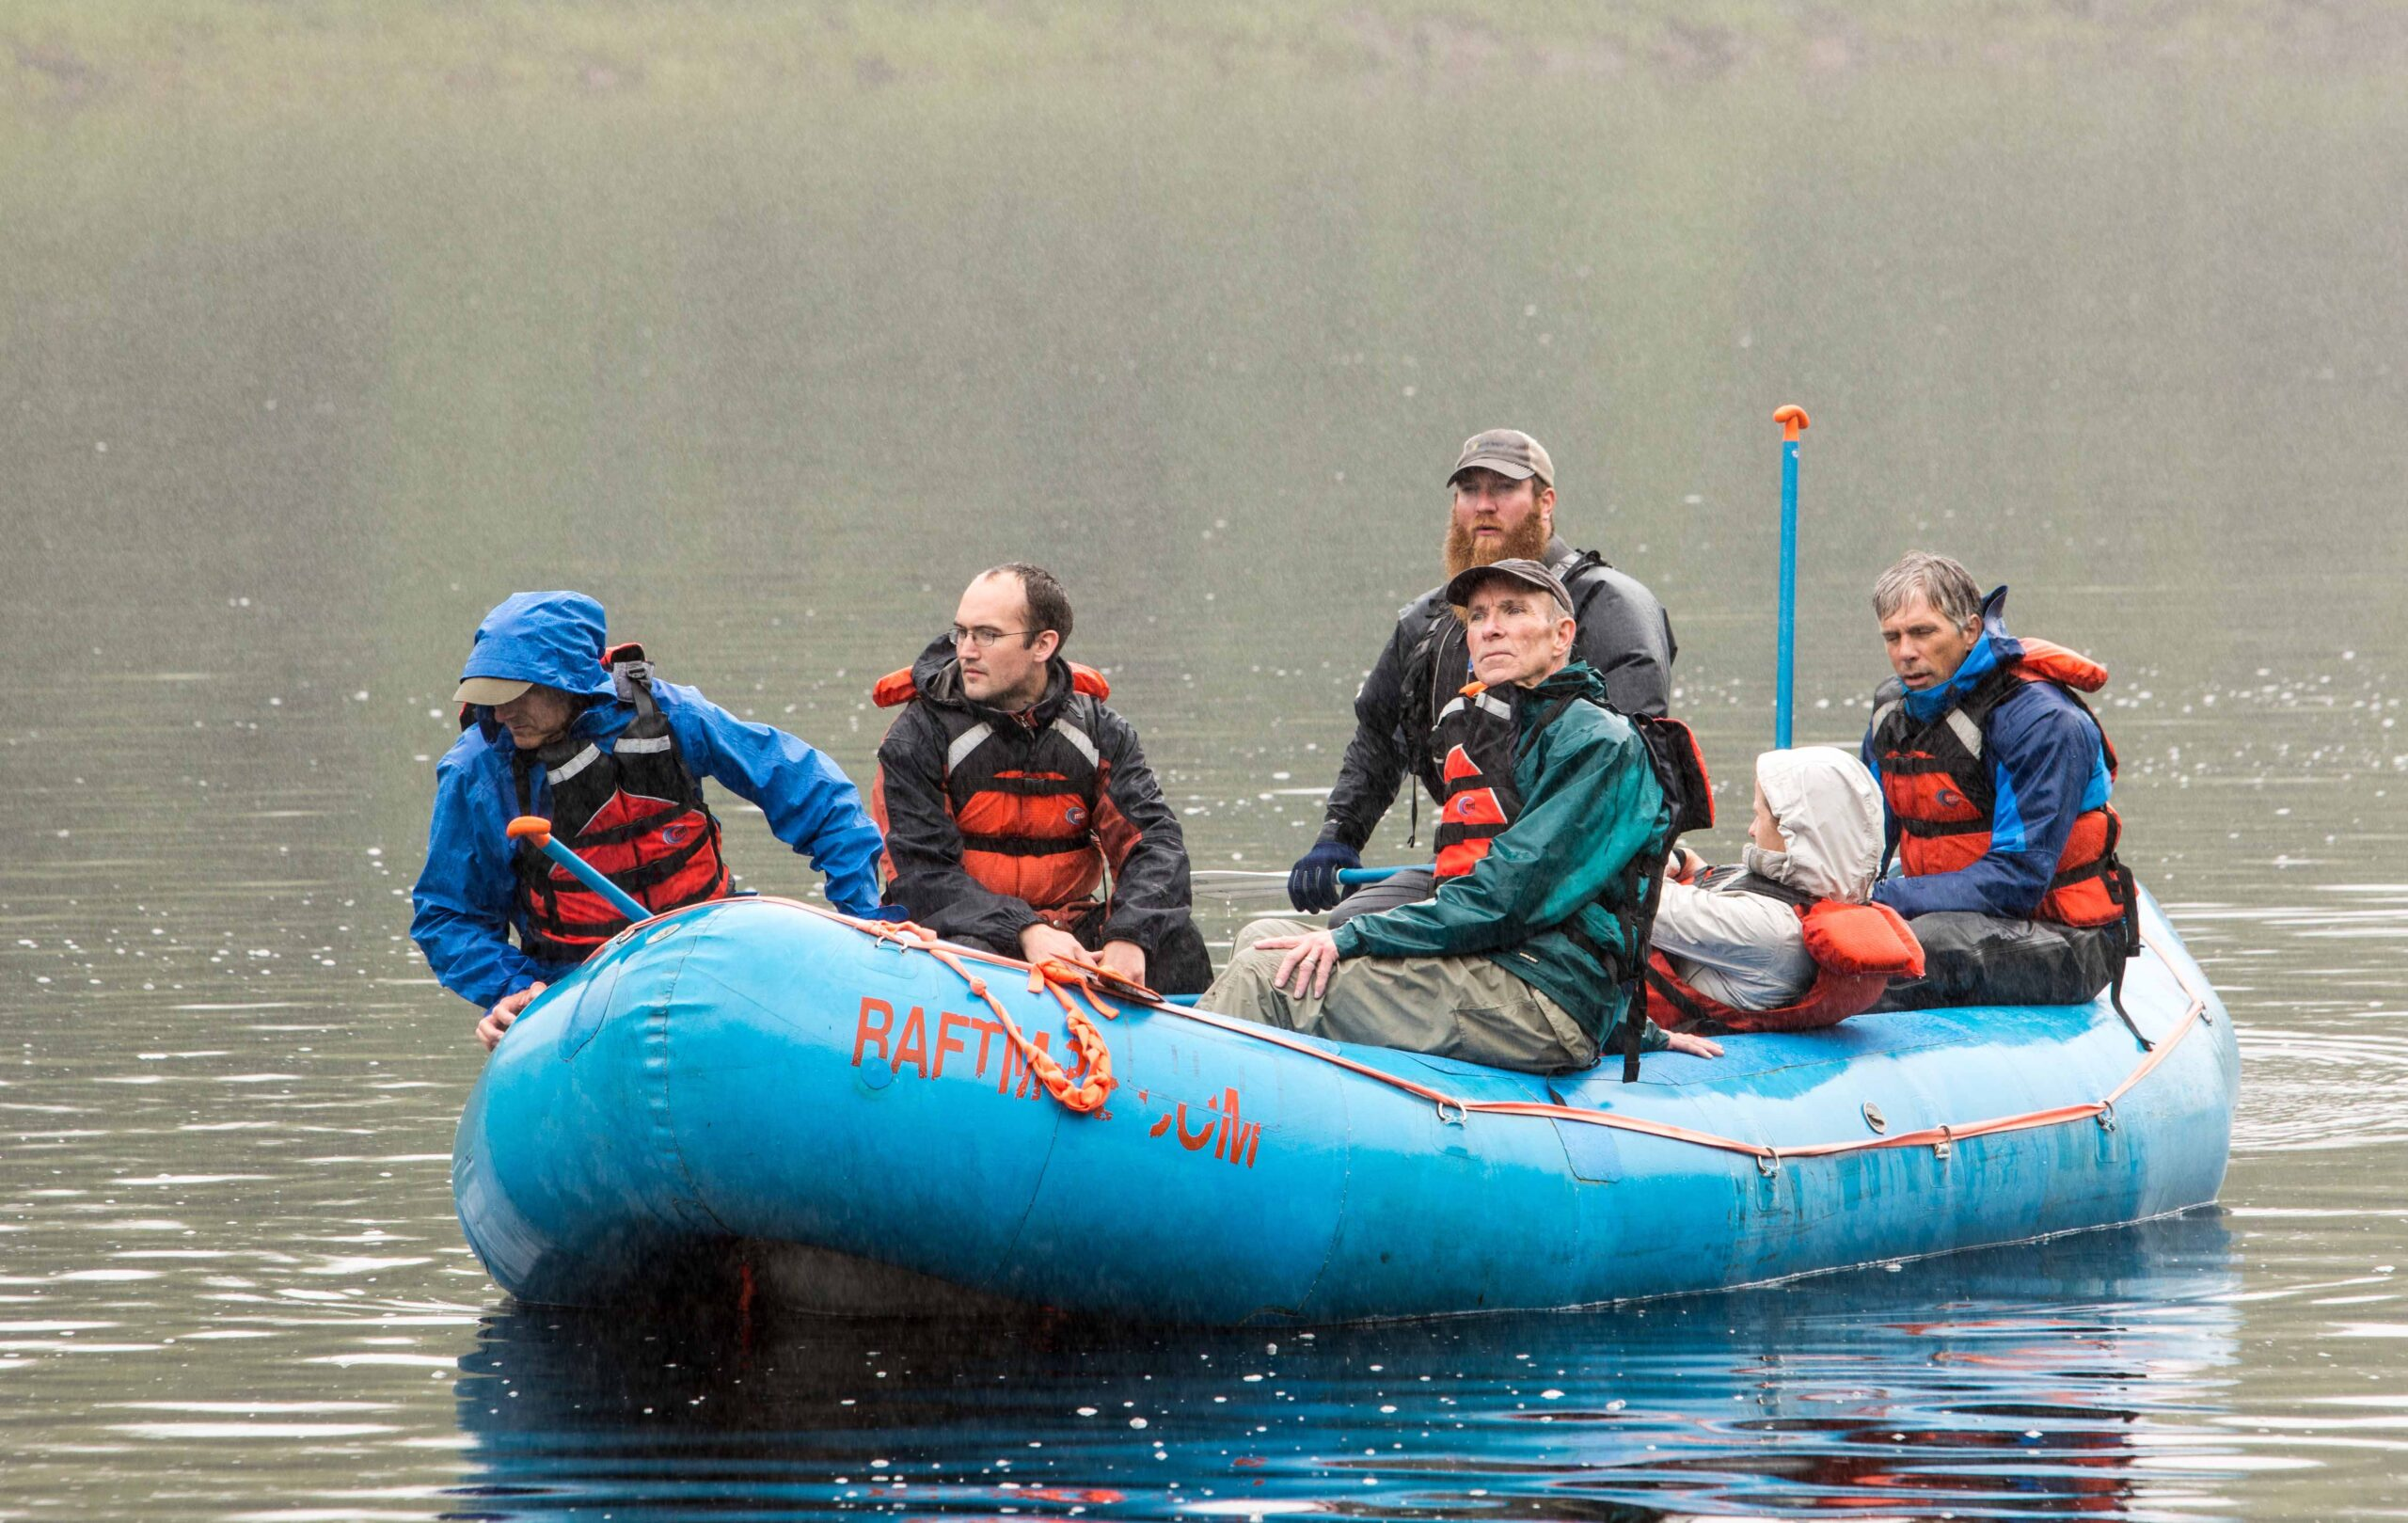 FoD rafting trip on Penobscot River